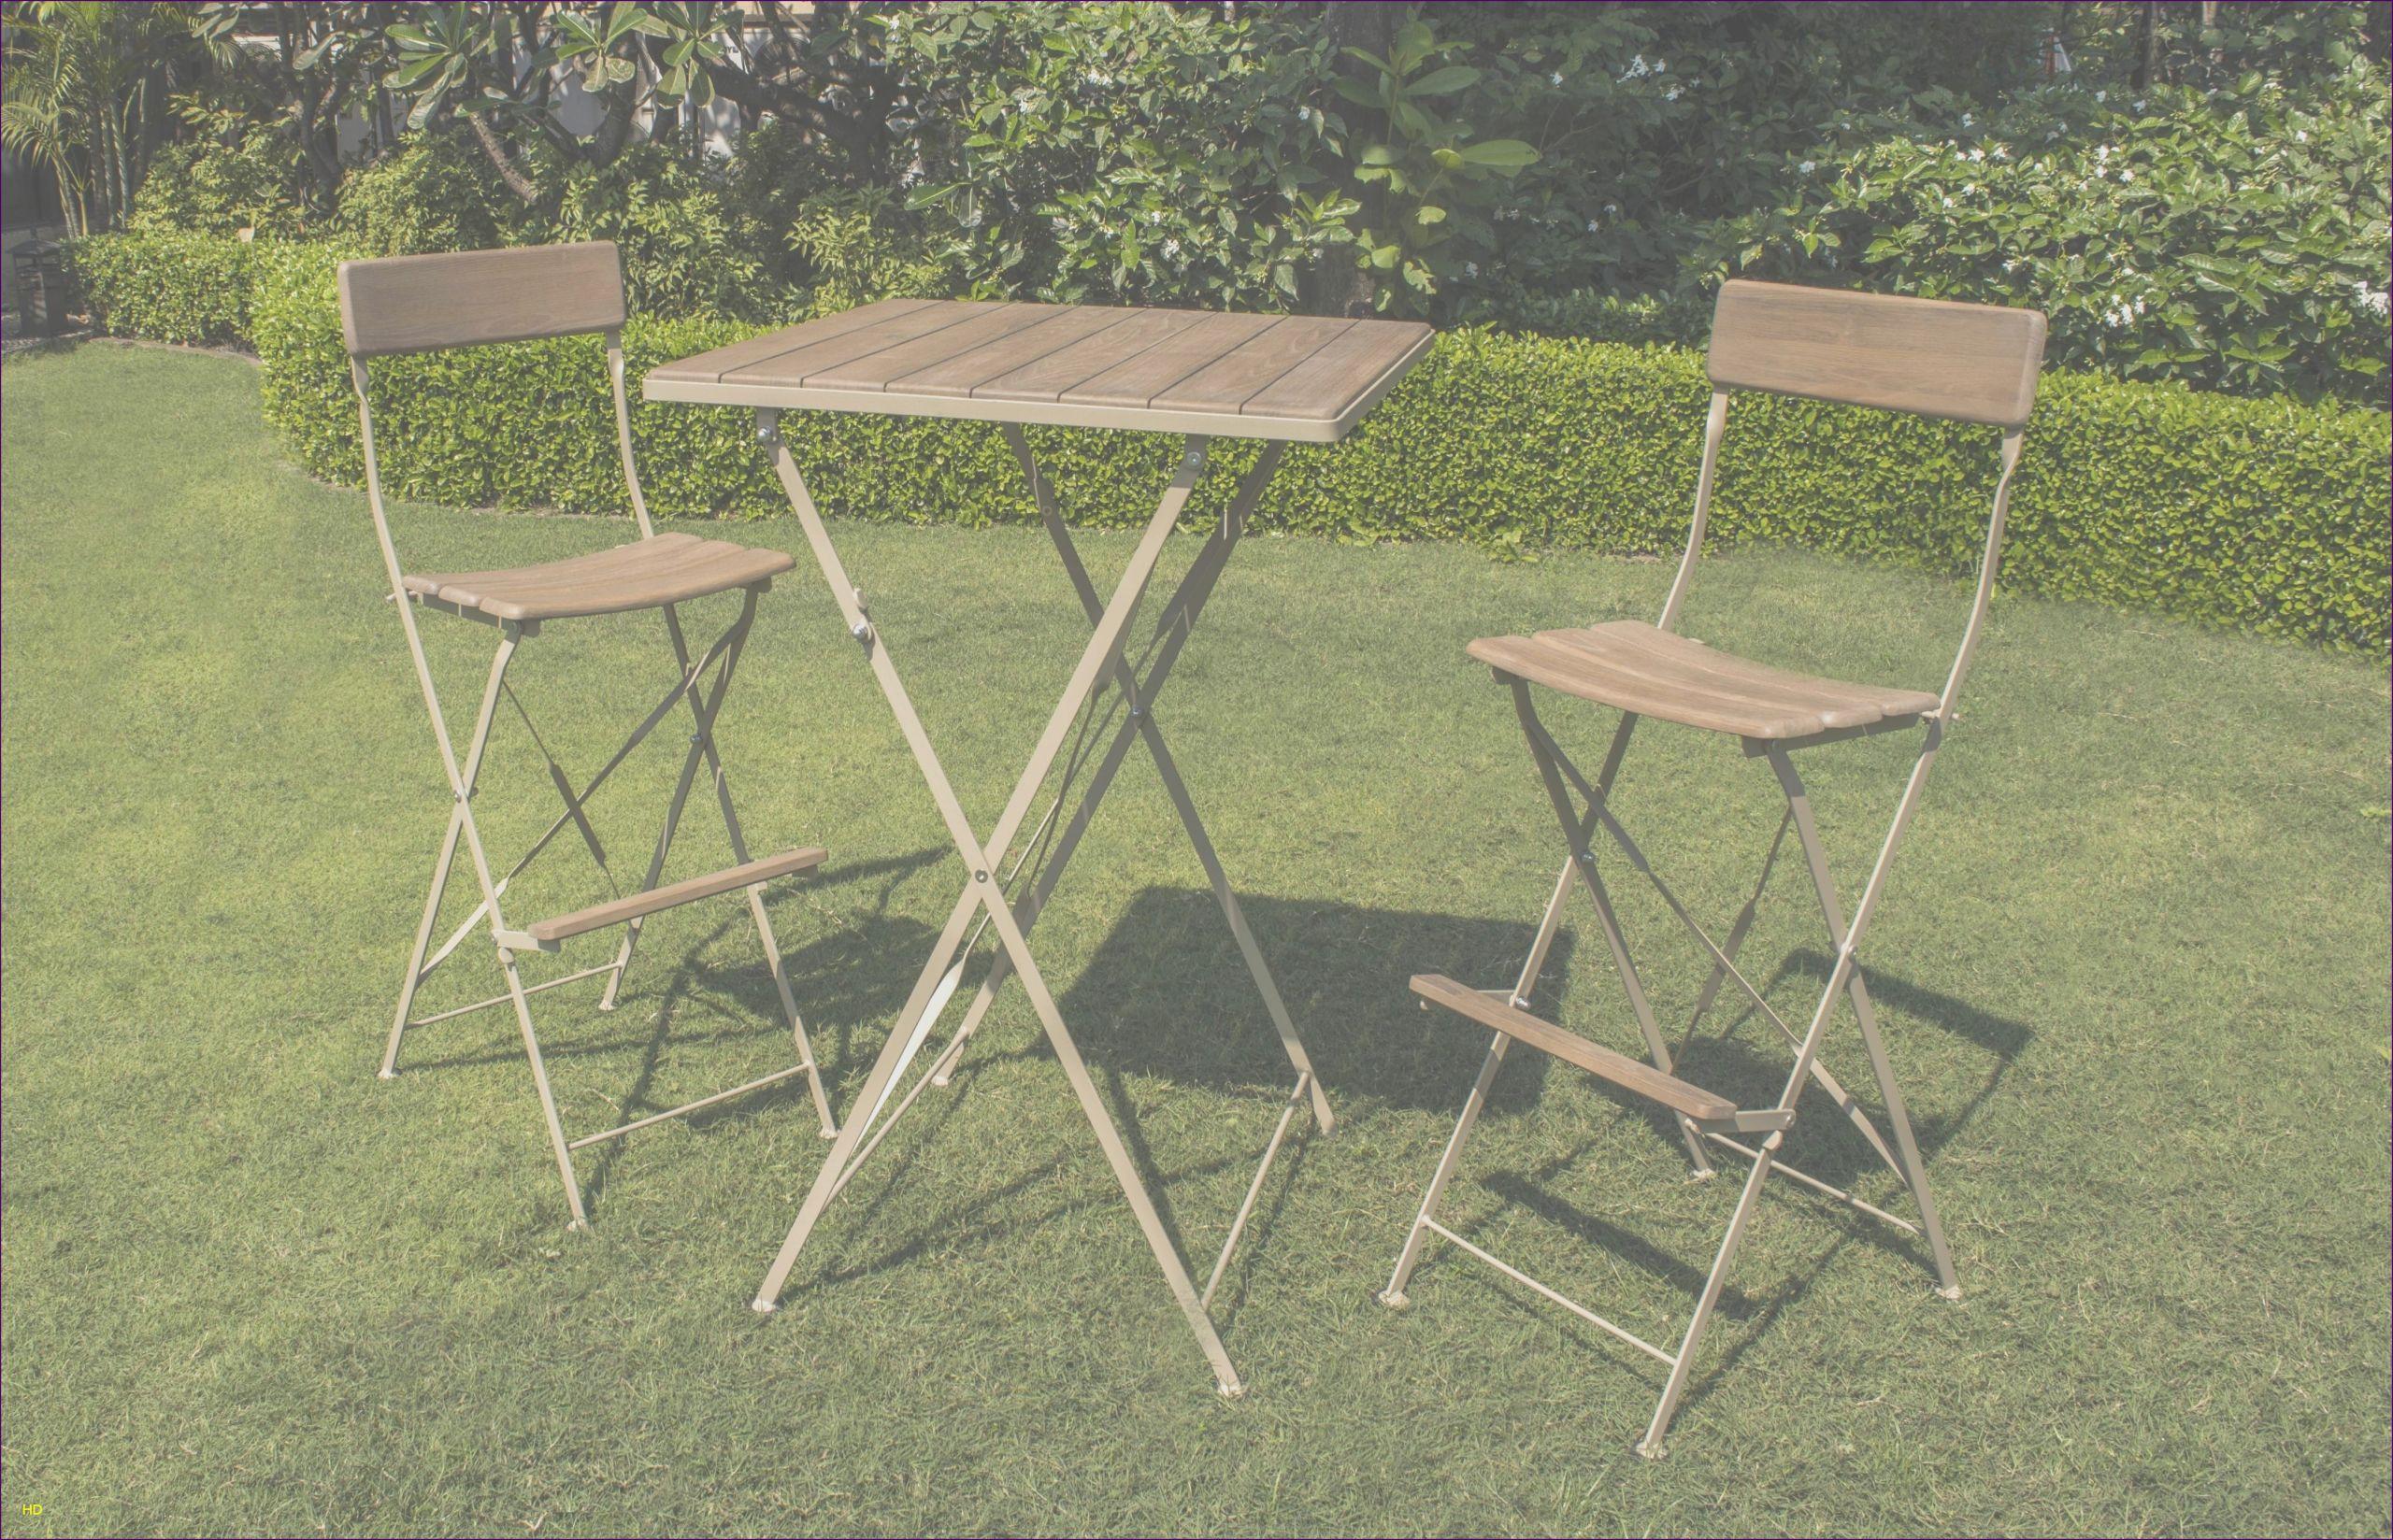 39 Beau Salon Jardin Rond | Salon Jardin concernant Table Et Chaises De Jardin Leclerc